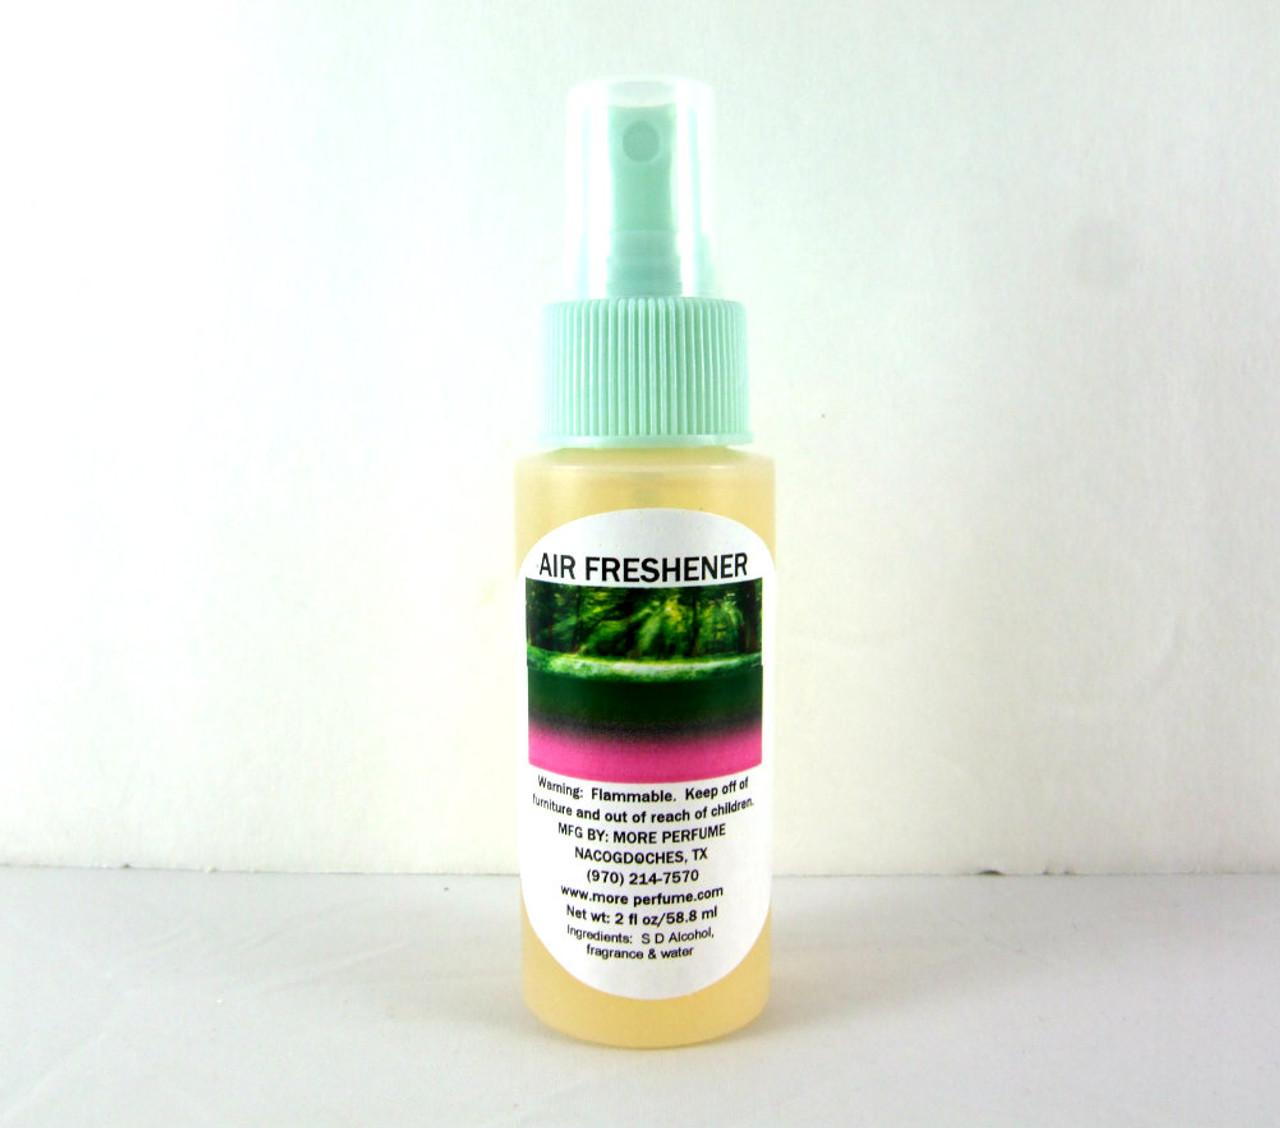 Yum Yum Apple Spice Concentrated Air Freshener 2 Oz Spray